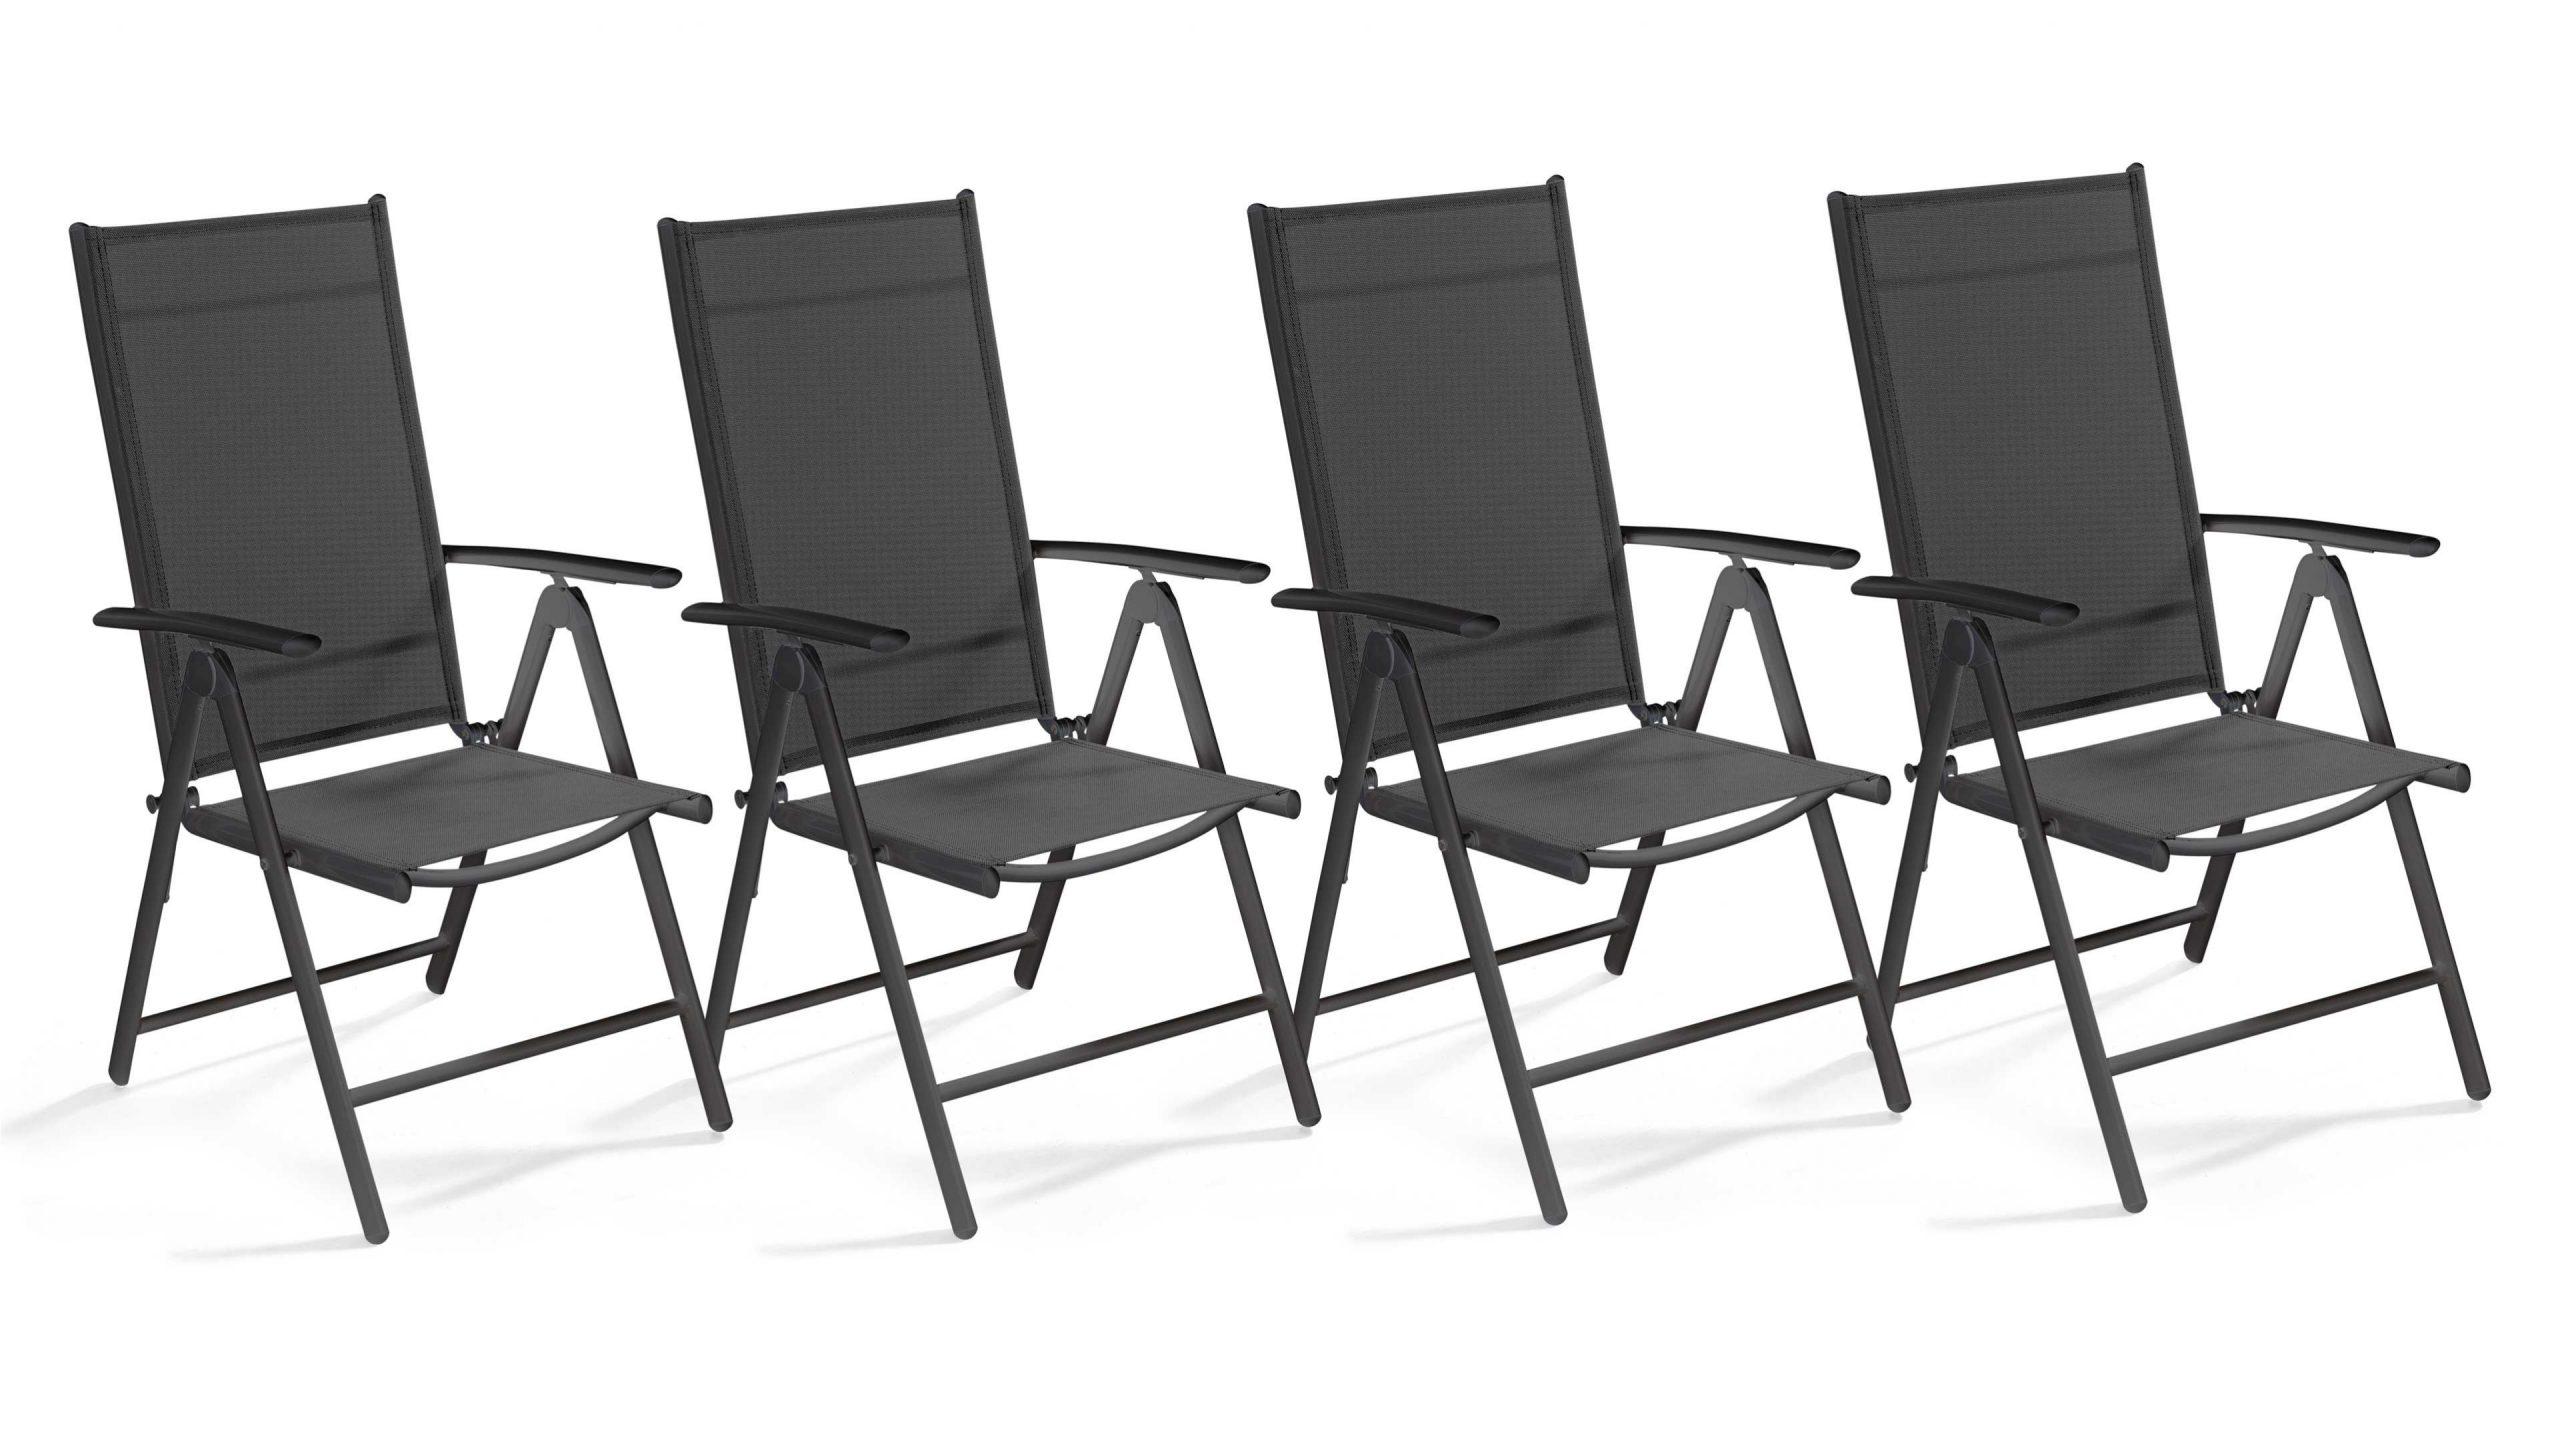 4 Fauteuils De Jardin Multi-Positions pour Fauteuil De Jardin Pliant Multiposition